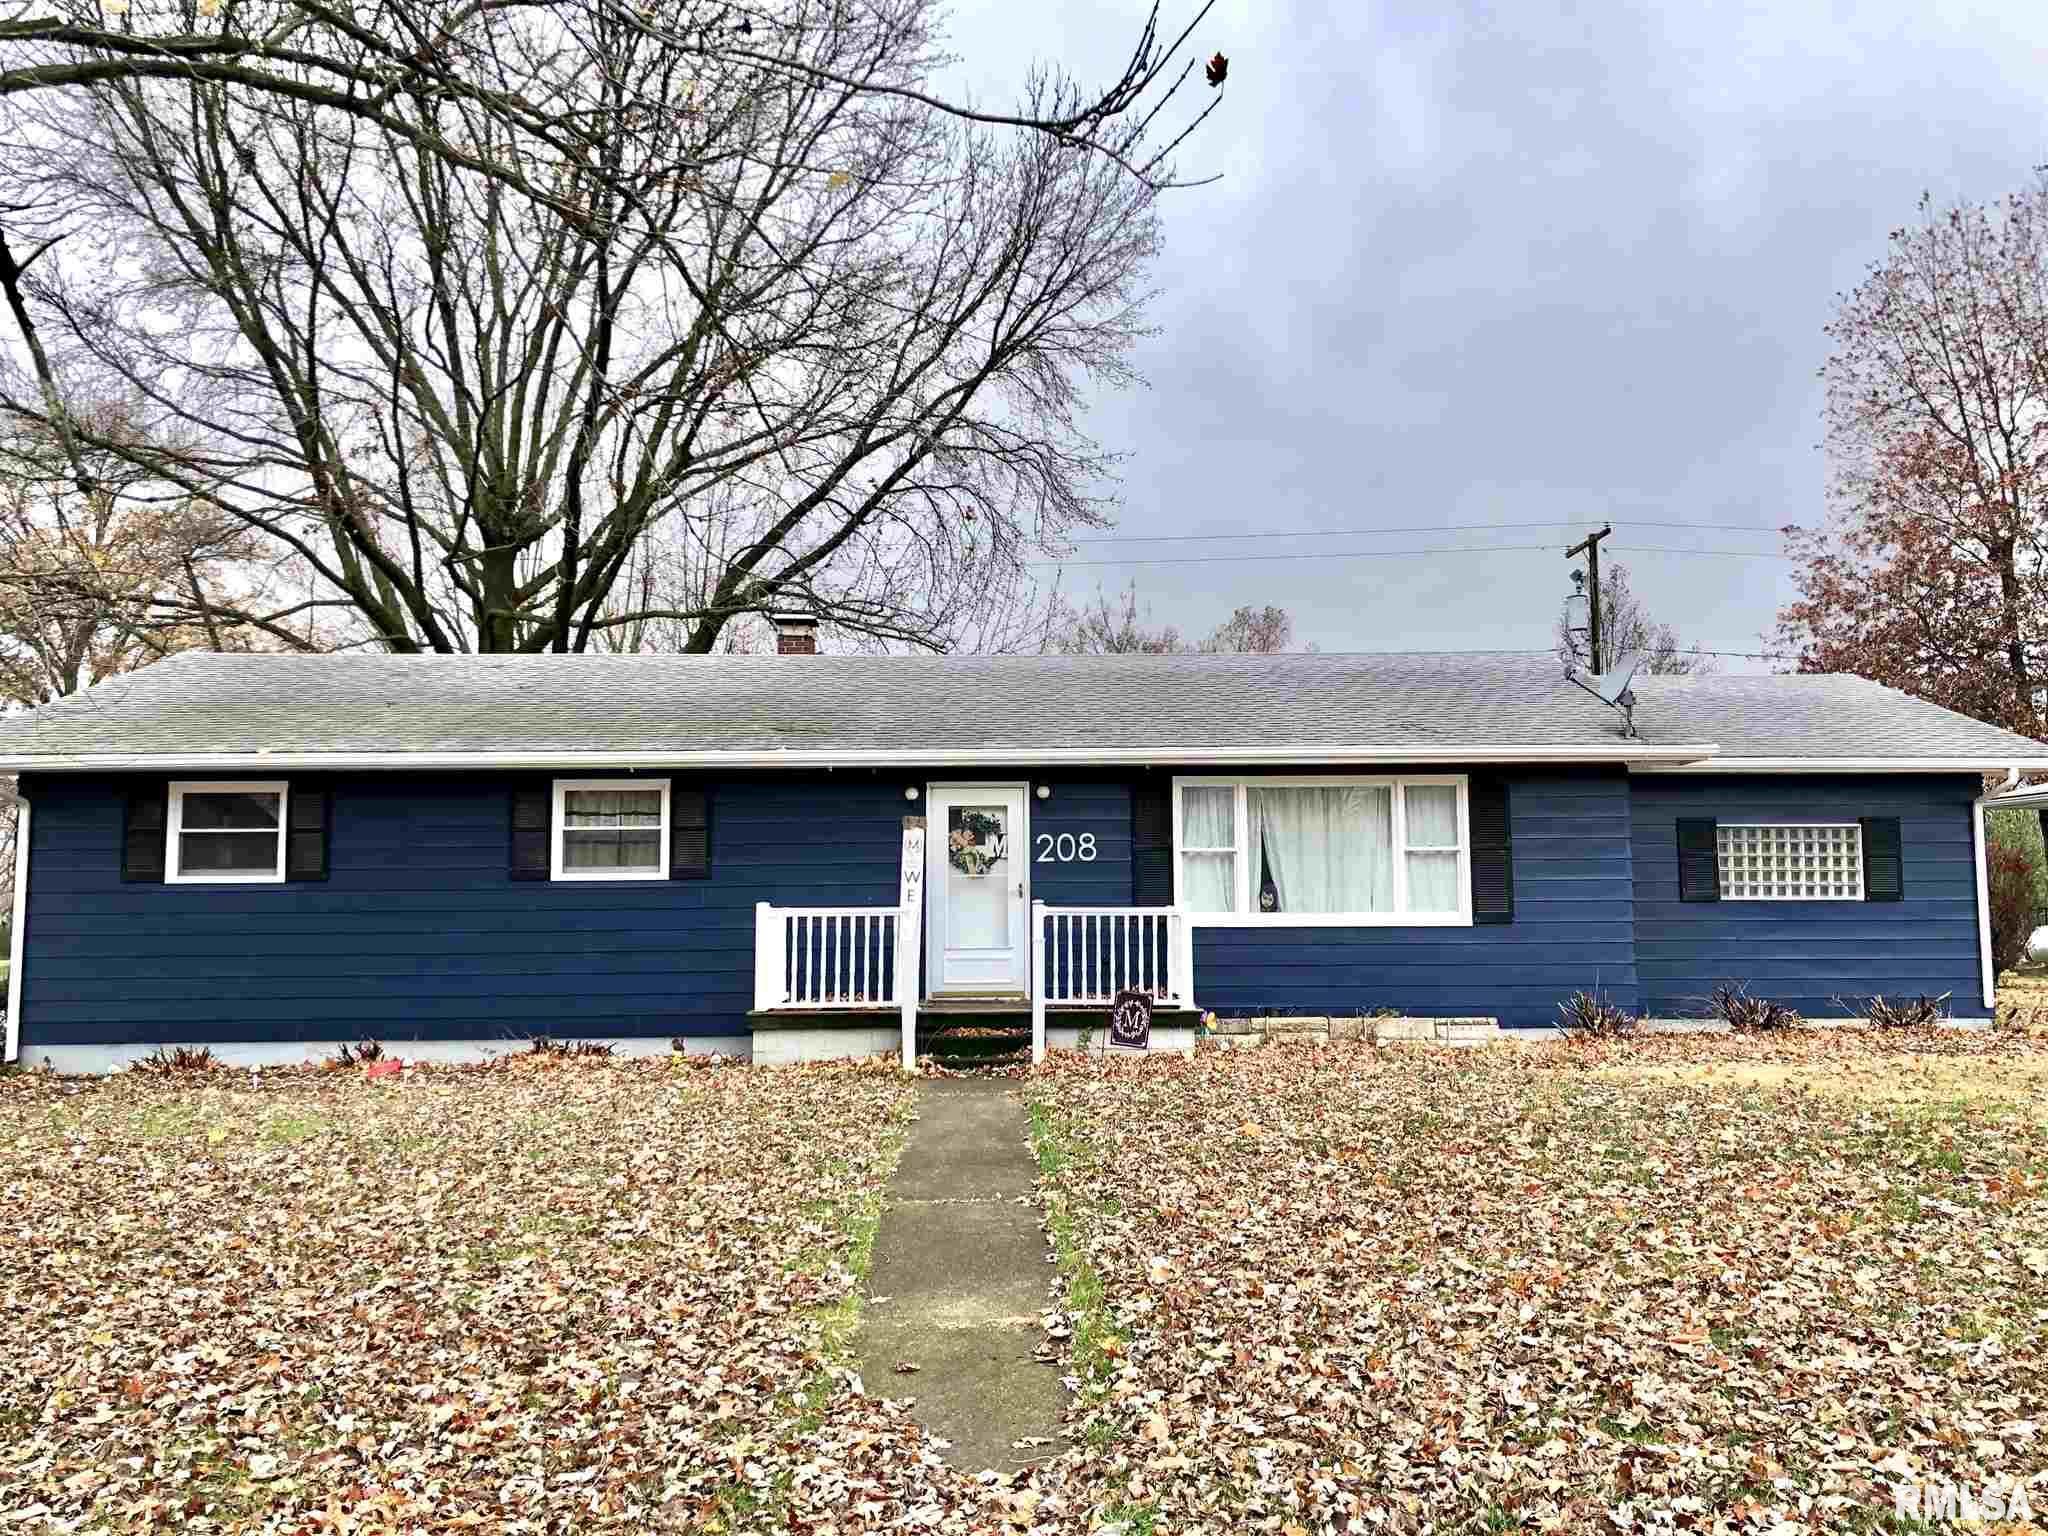 208 S 4TH Property Photo - Irvington, IL real estate listing